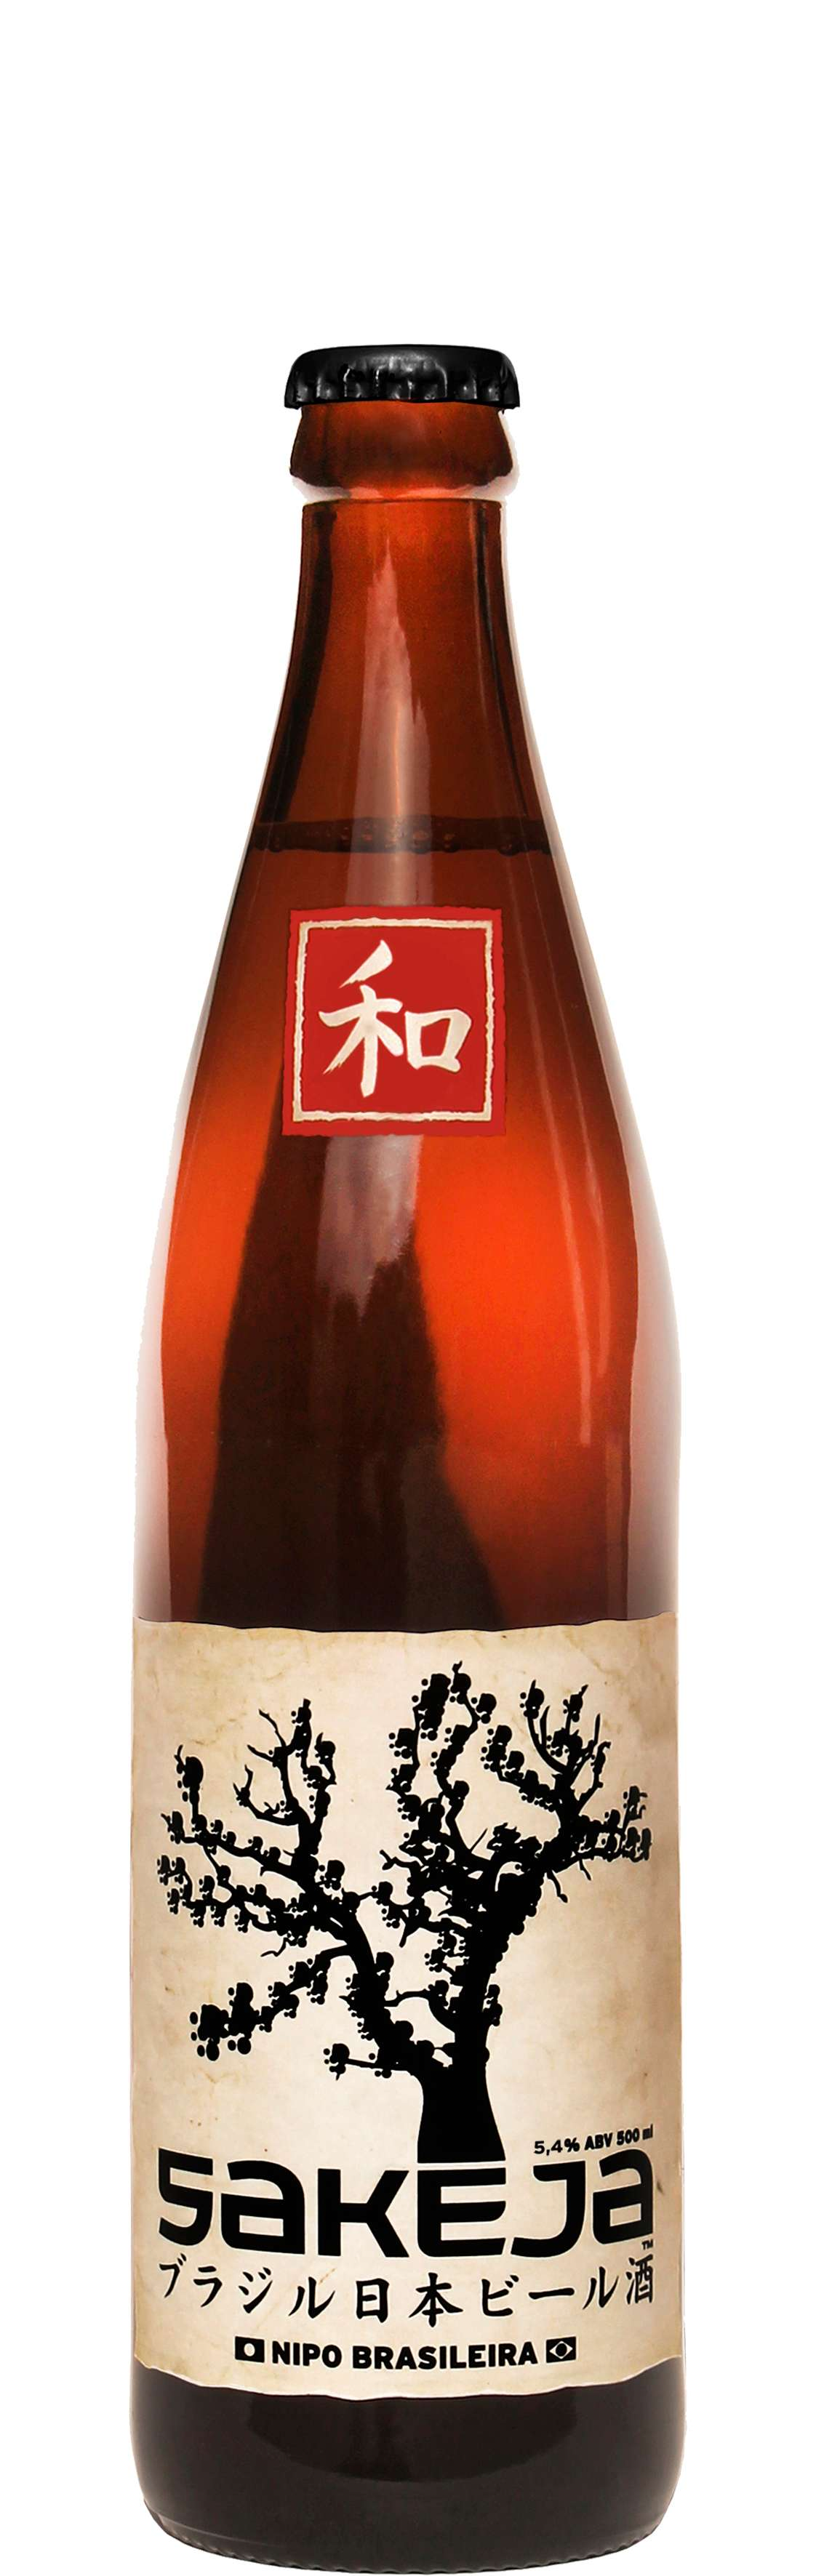 Way Sakeja - Cerveja com Sake